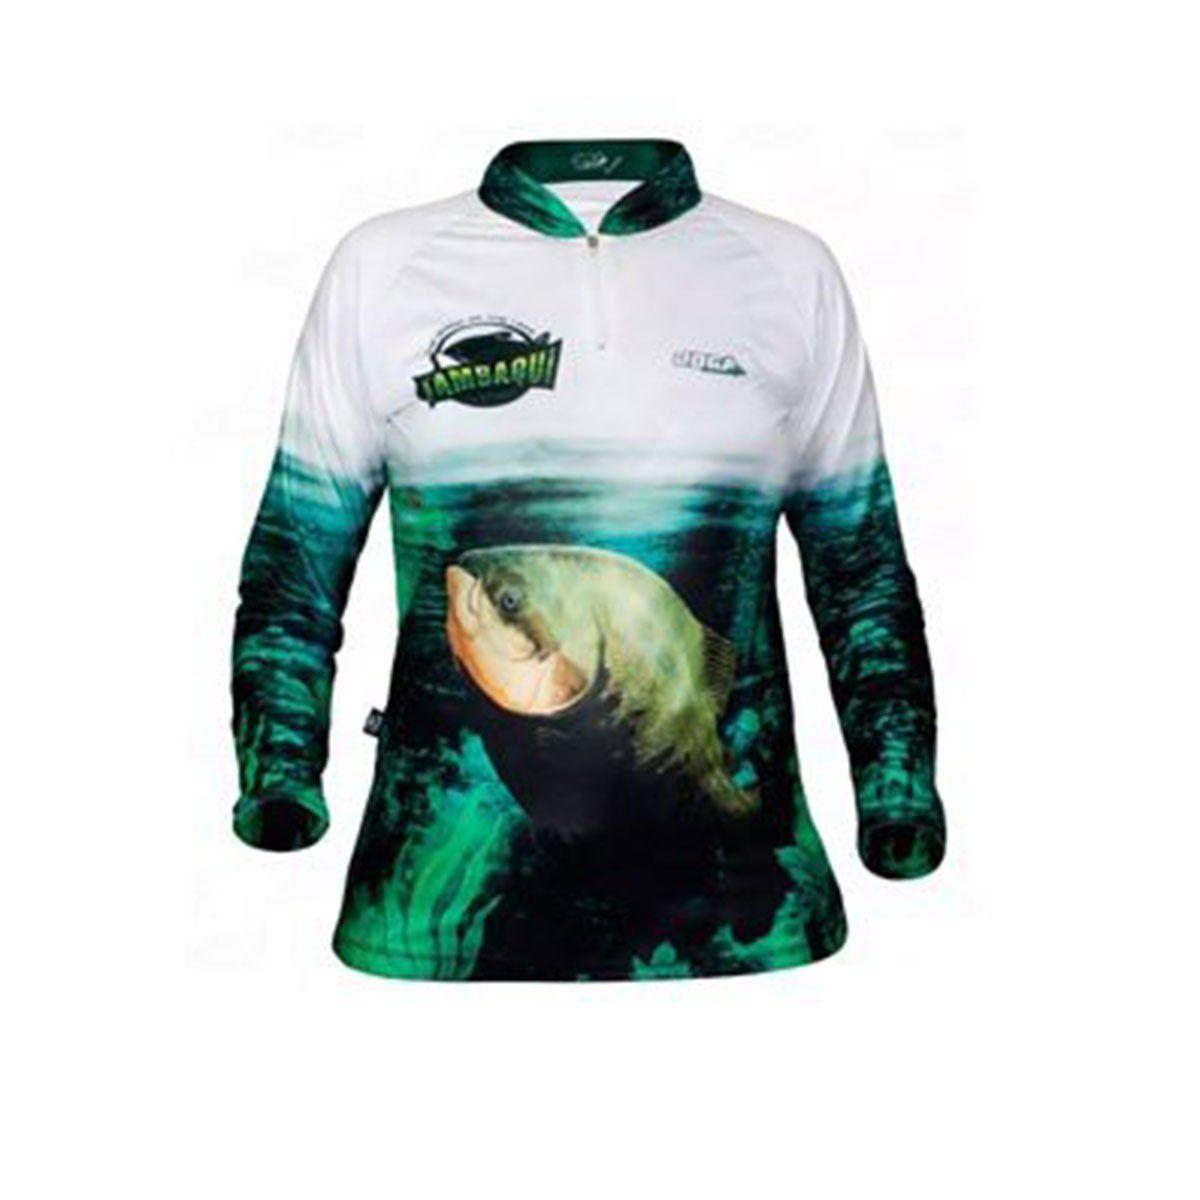 Camisa Joga Feminina Esportiva UVM 50 Tambaqui